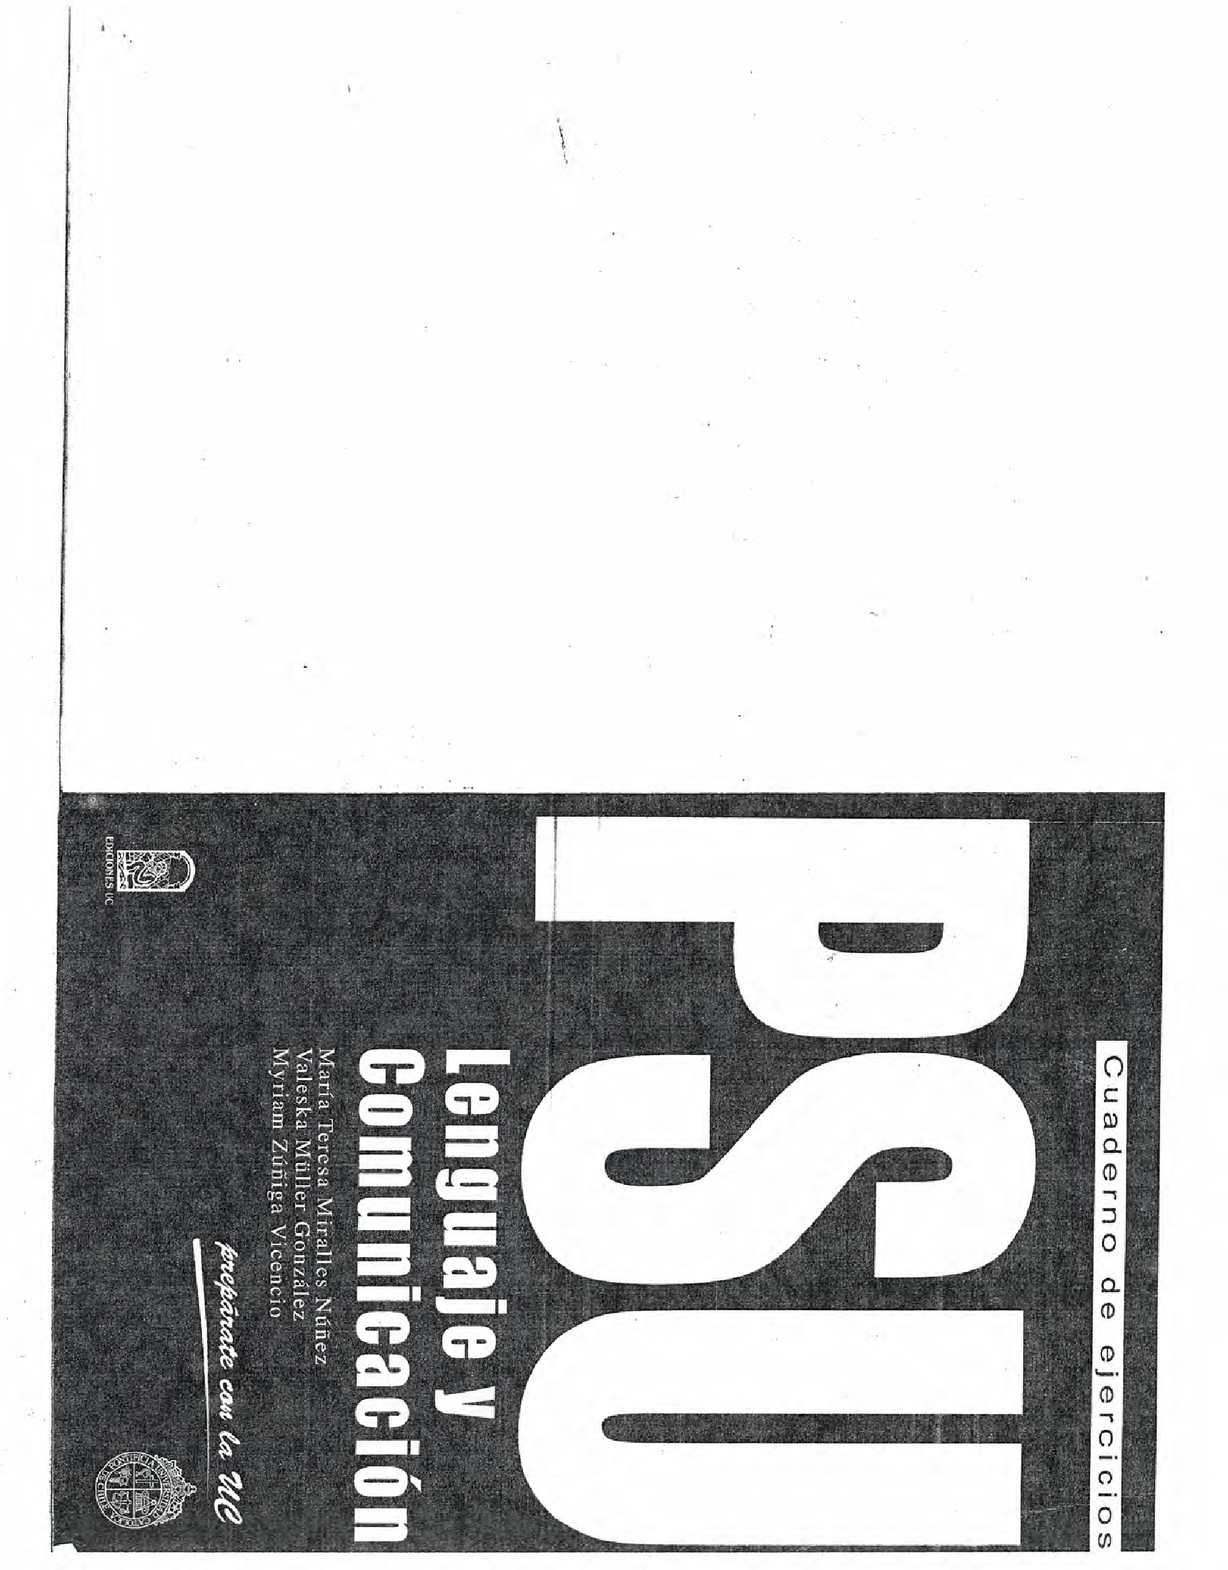 Calaméo - Libro PSU Lenguaje UC - Completo